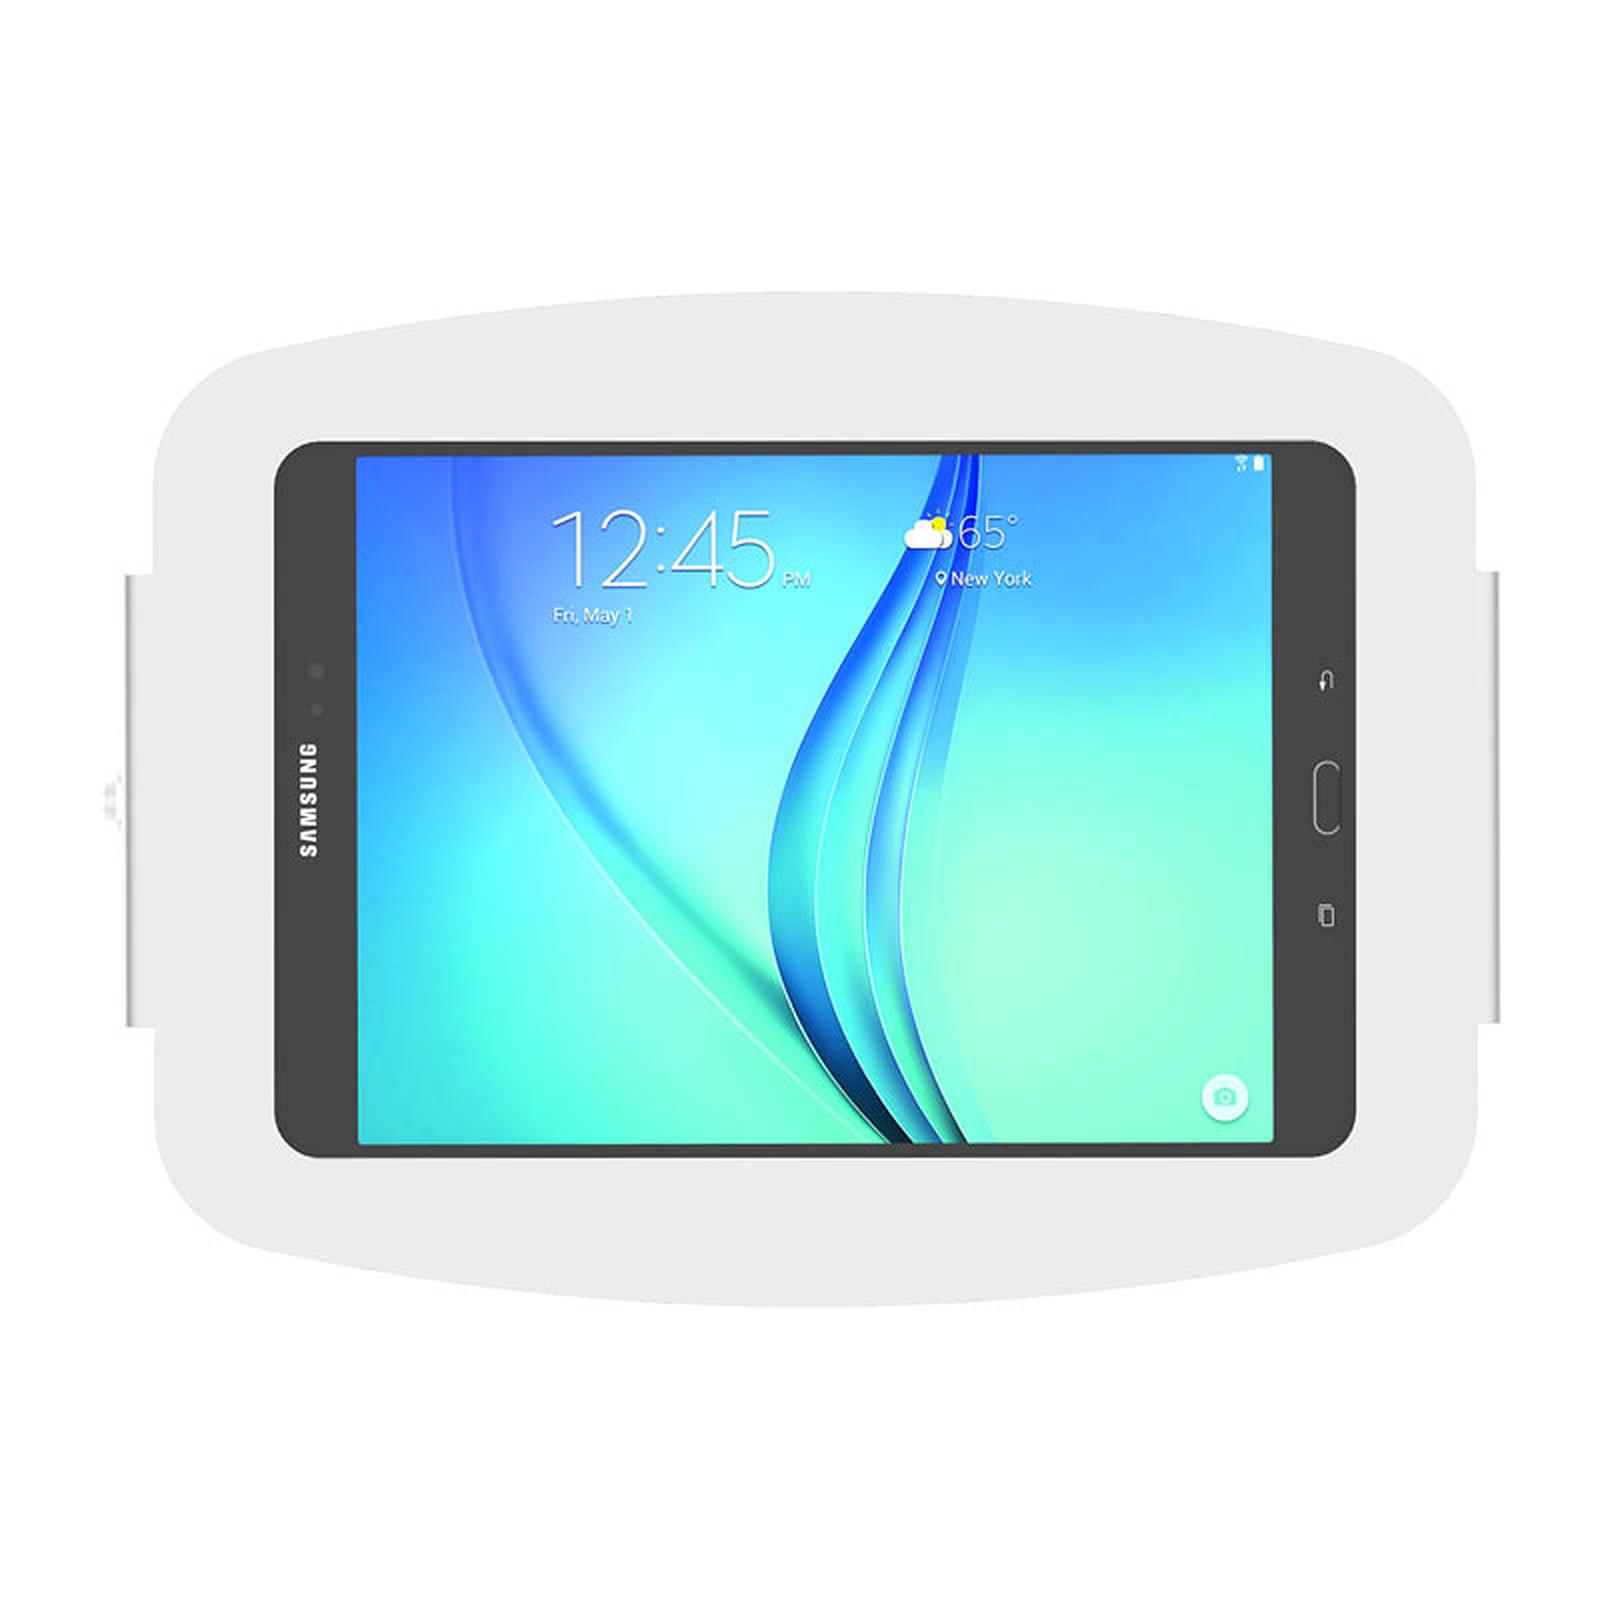 7d69294a77d Maclocks Space Galaxy Tab A 10.1 Tablet Enclosure Wall Mount Blanc Support  mural avec verrou pour